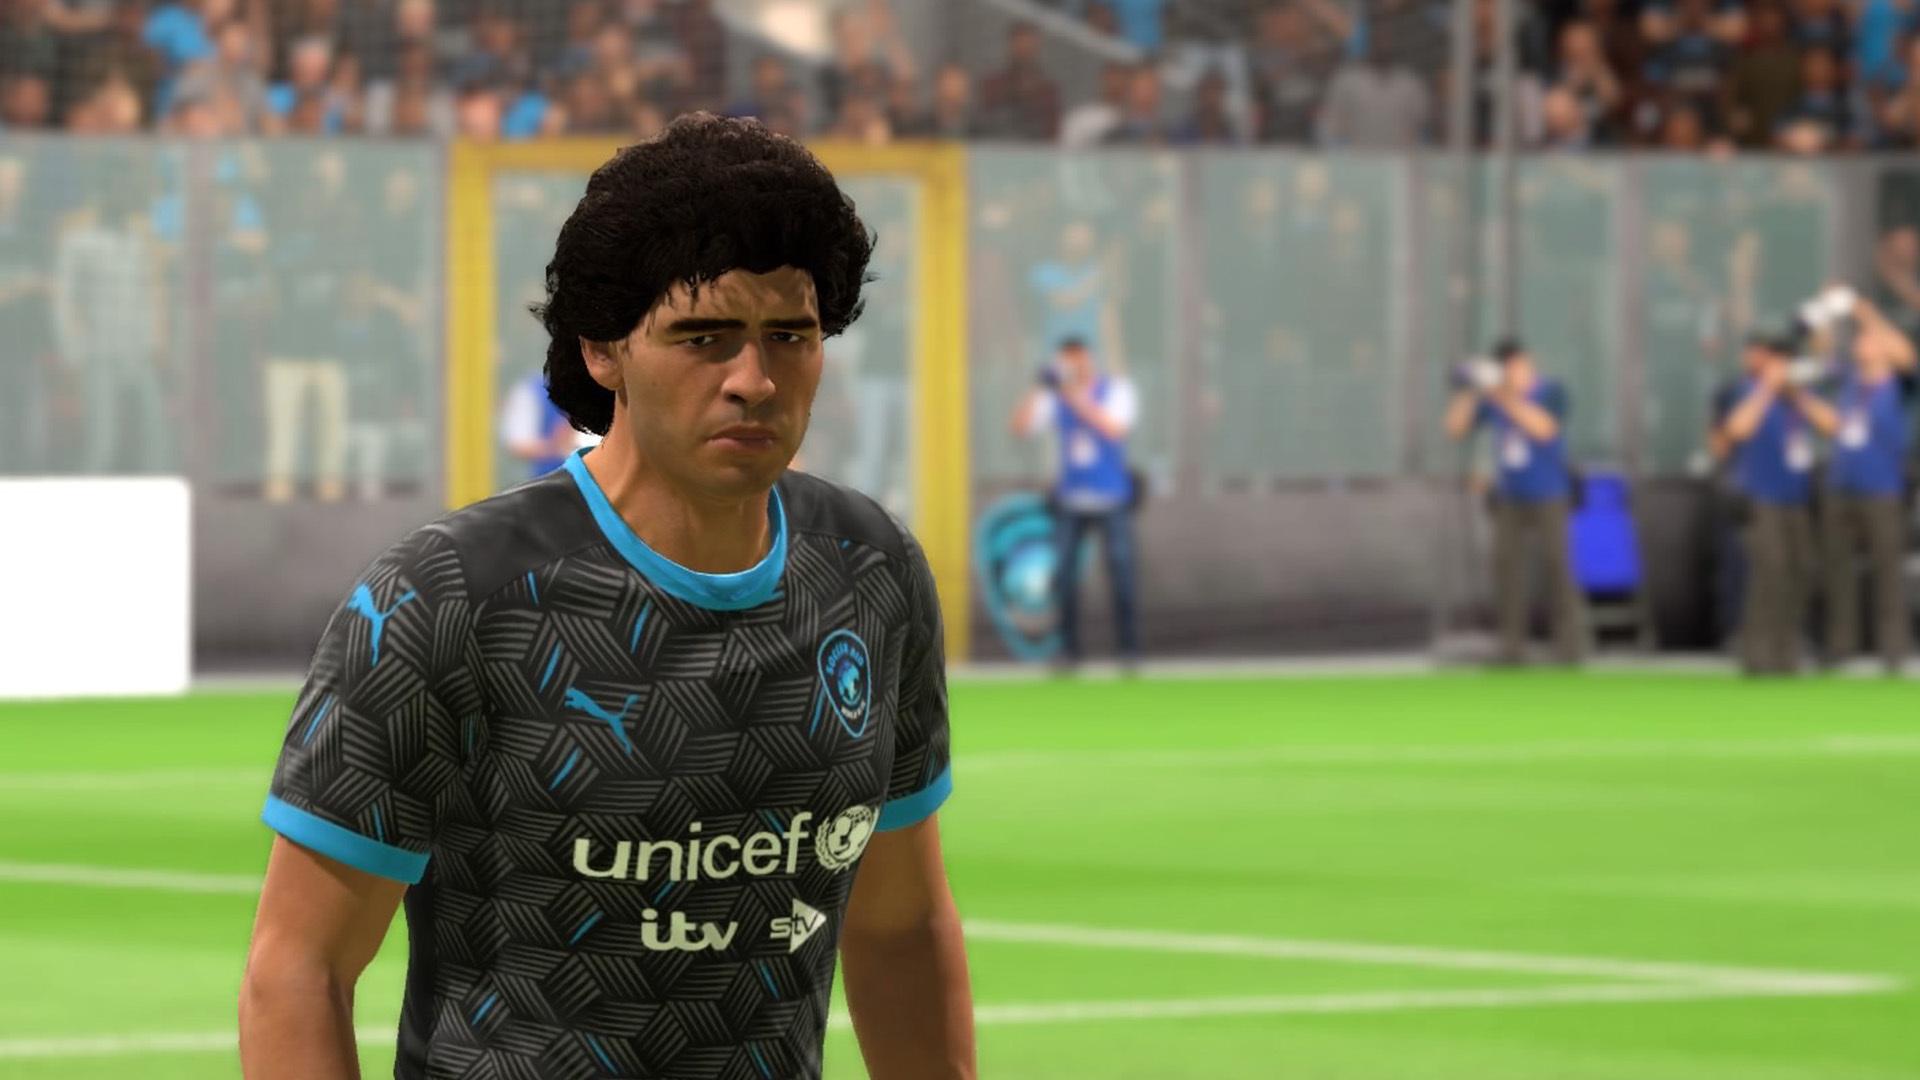 Soccer Aid World Xi Playable On Fifa 20 Featuring Maradona Pele Ronaldinho Giggs And More Fourfourtwo